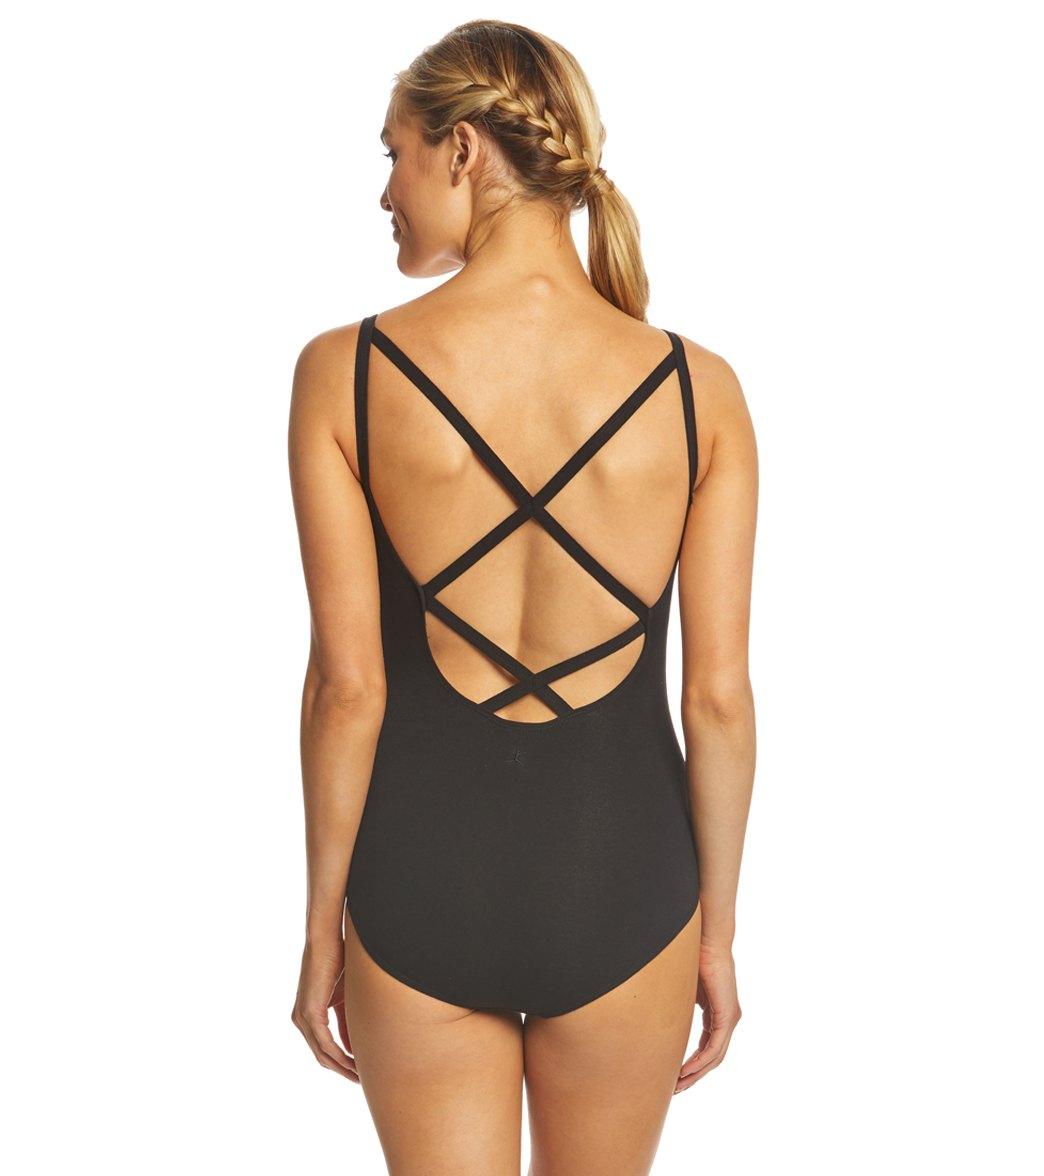 f46a1f680e514 Danskin Cross Back Cami Yoga   Dance Leotard at YogaOutlet.com